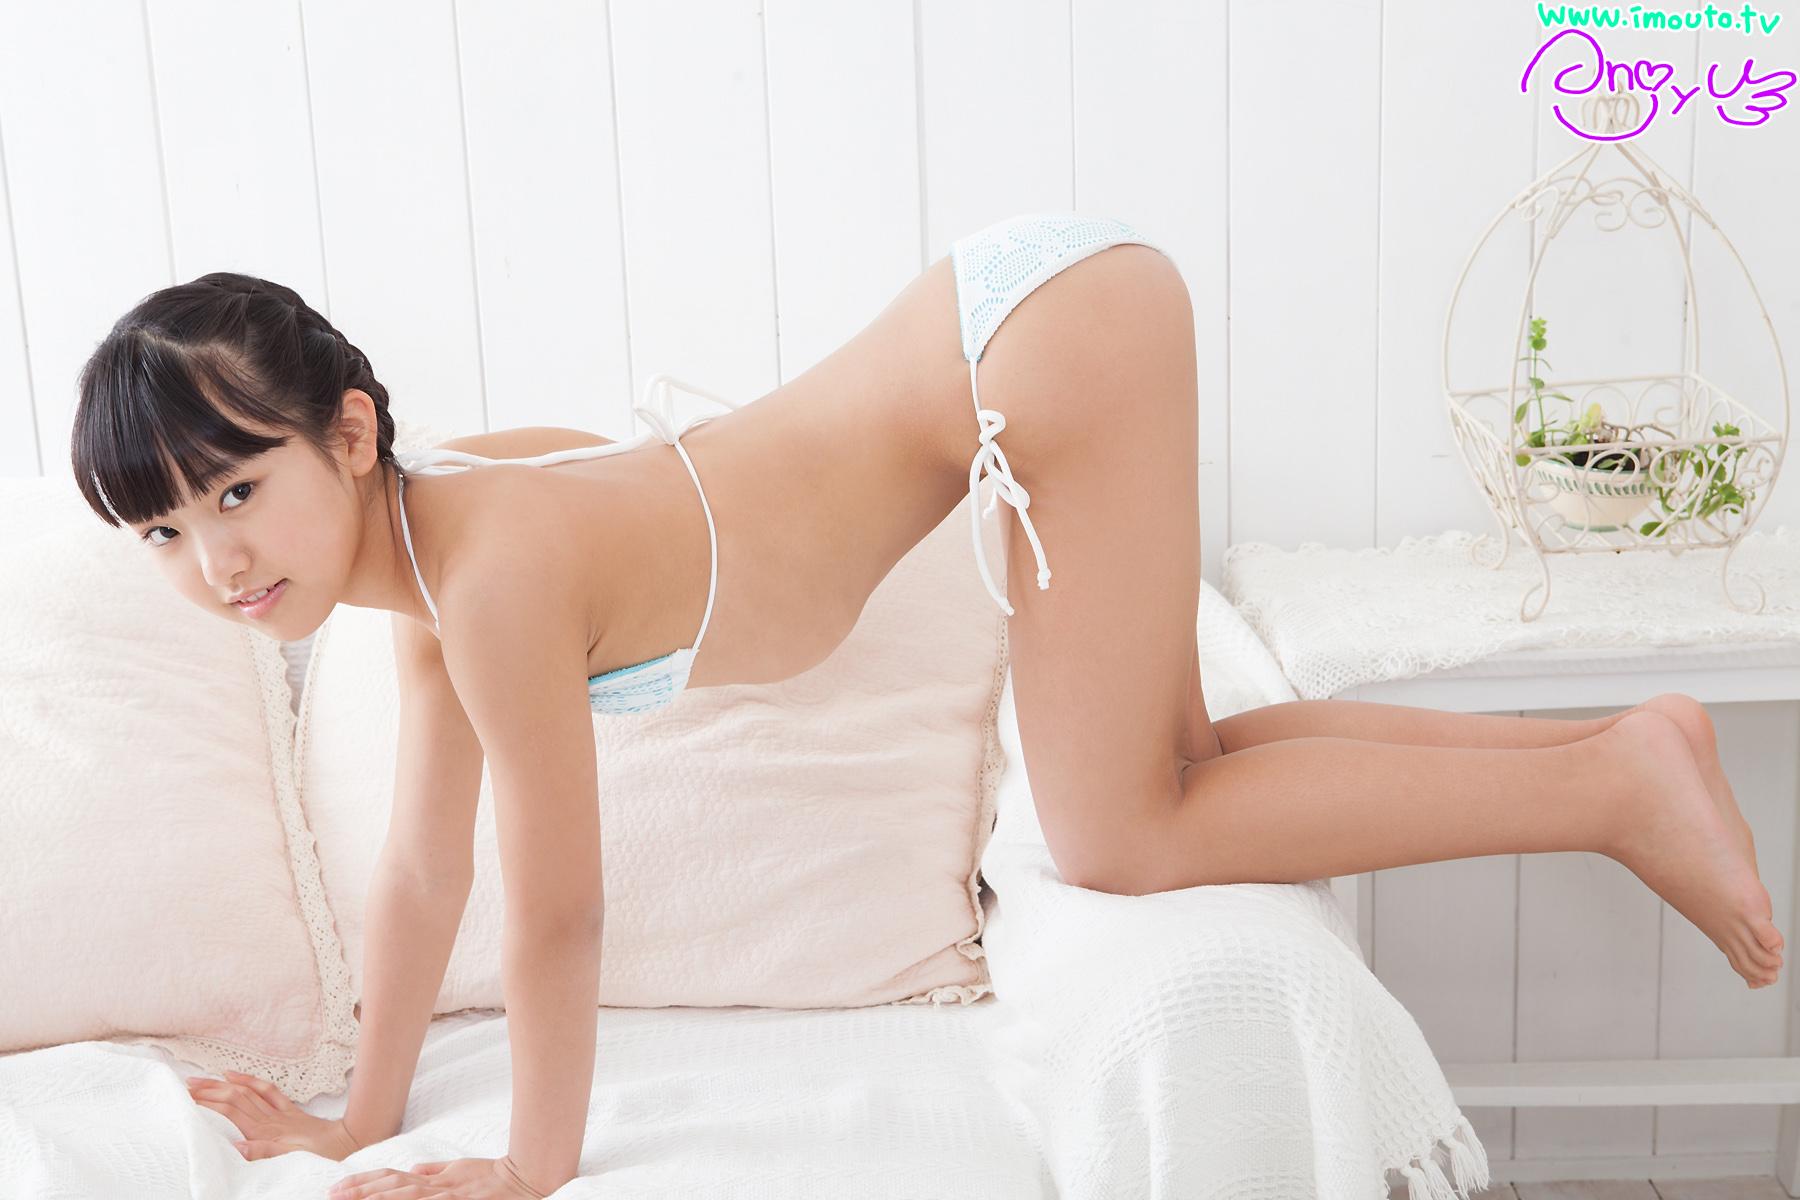 kouzuki  Anjyu   imouto.tv ... gravure promotion pictures, Kouzuki Anjyu (香月杏珠)